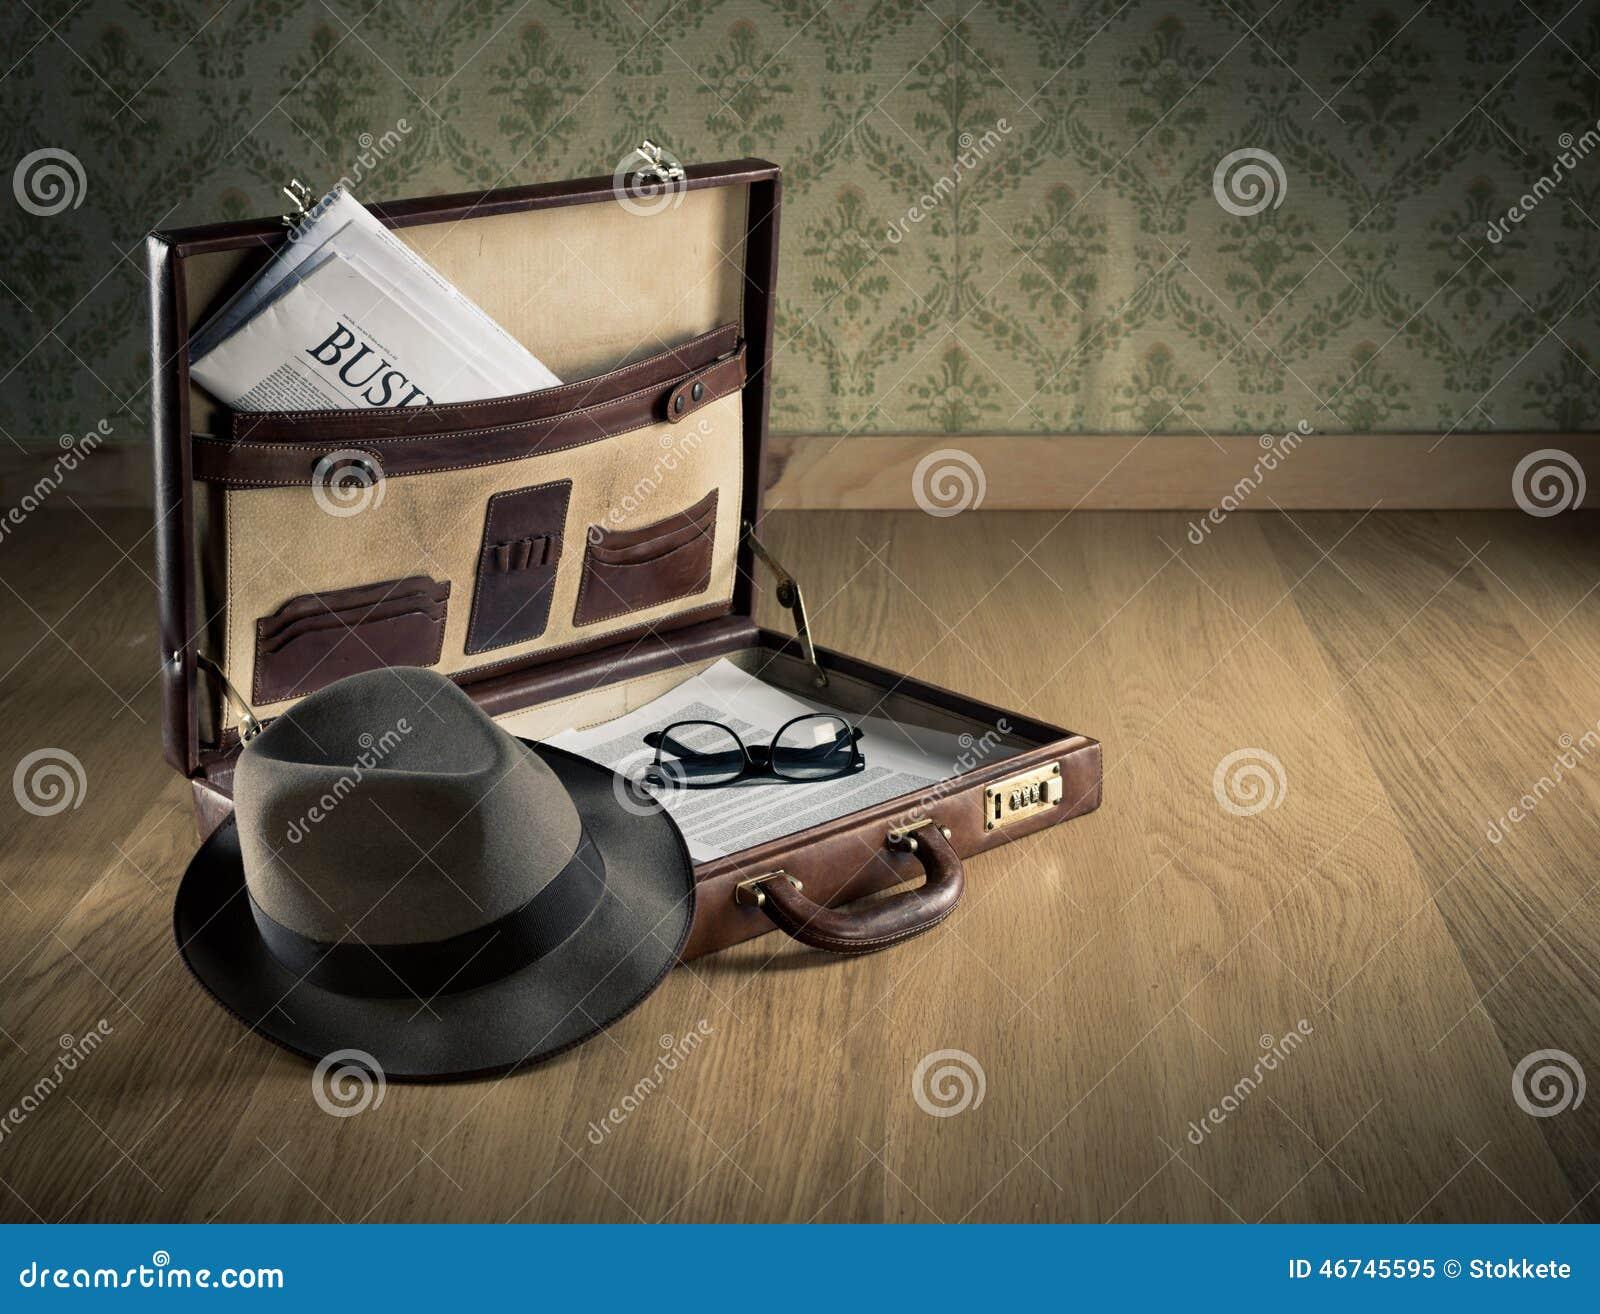 Vintage Businessman Briefcase Stock Image